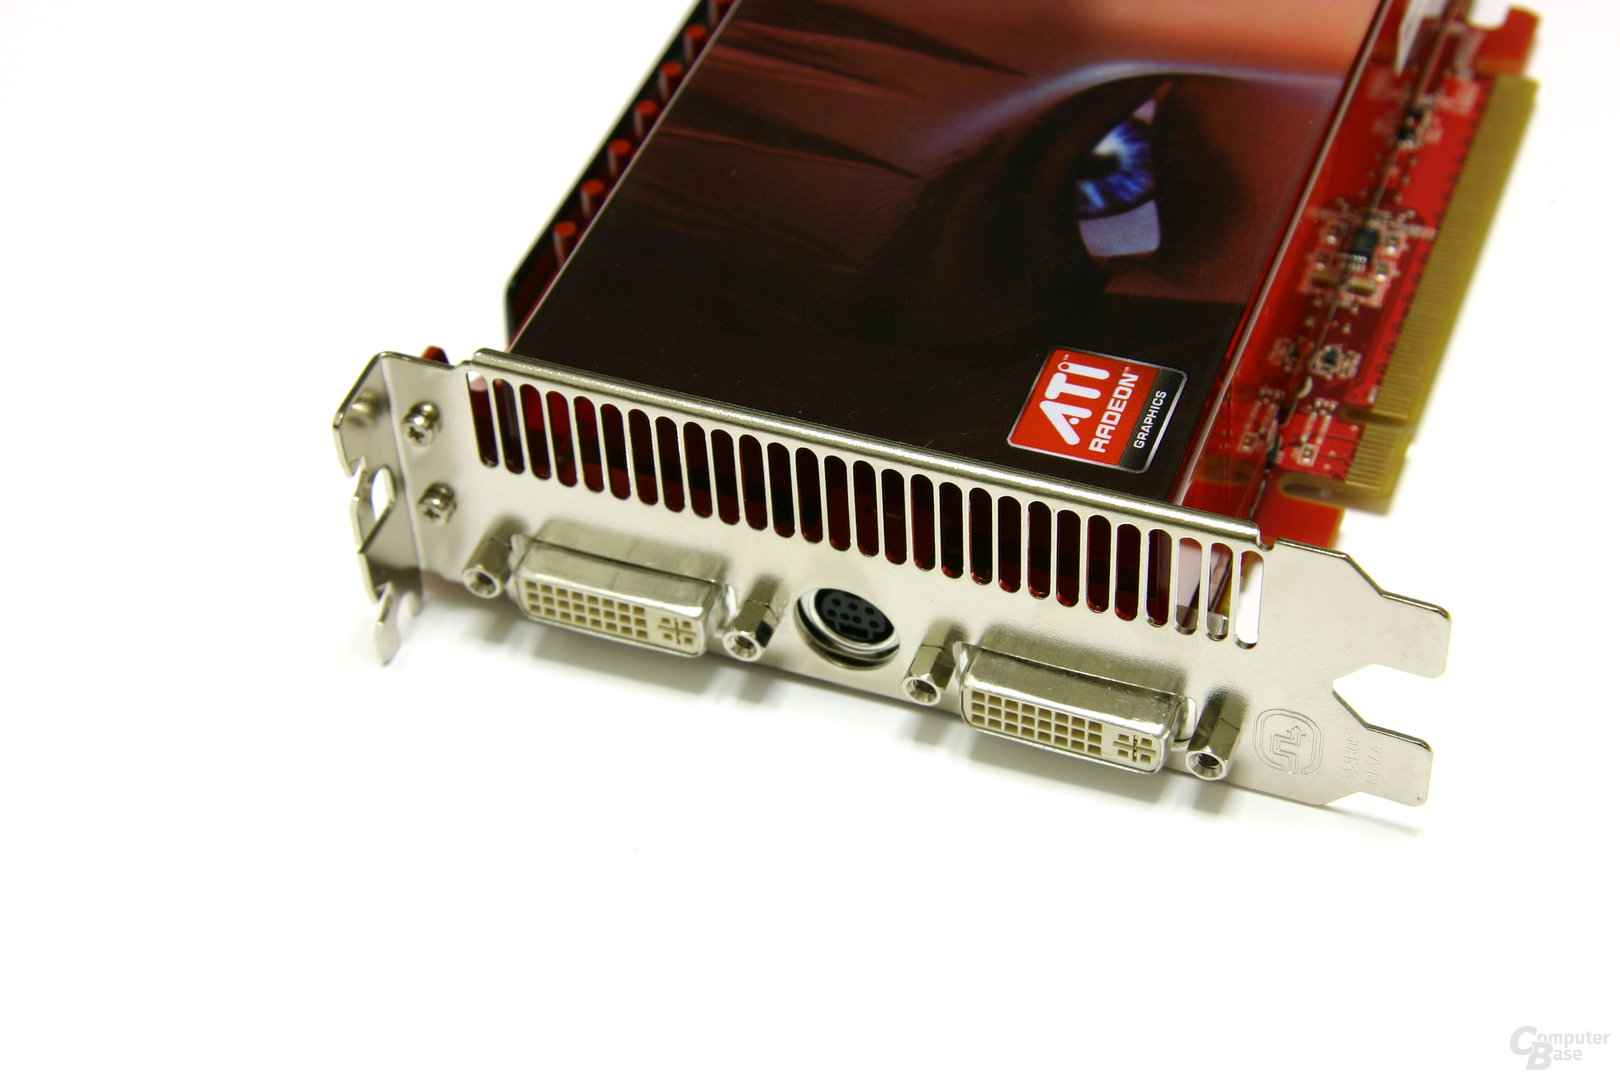 Radeon HD 3870 X2 Slotblech